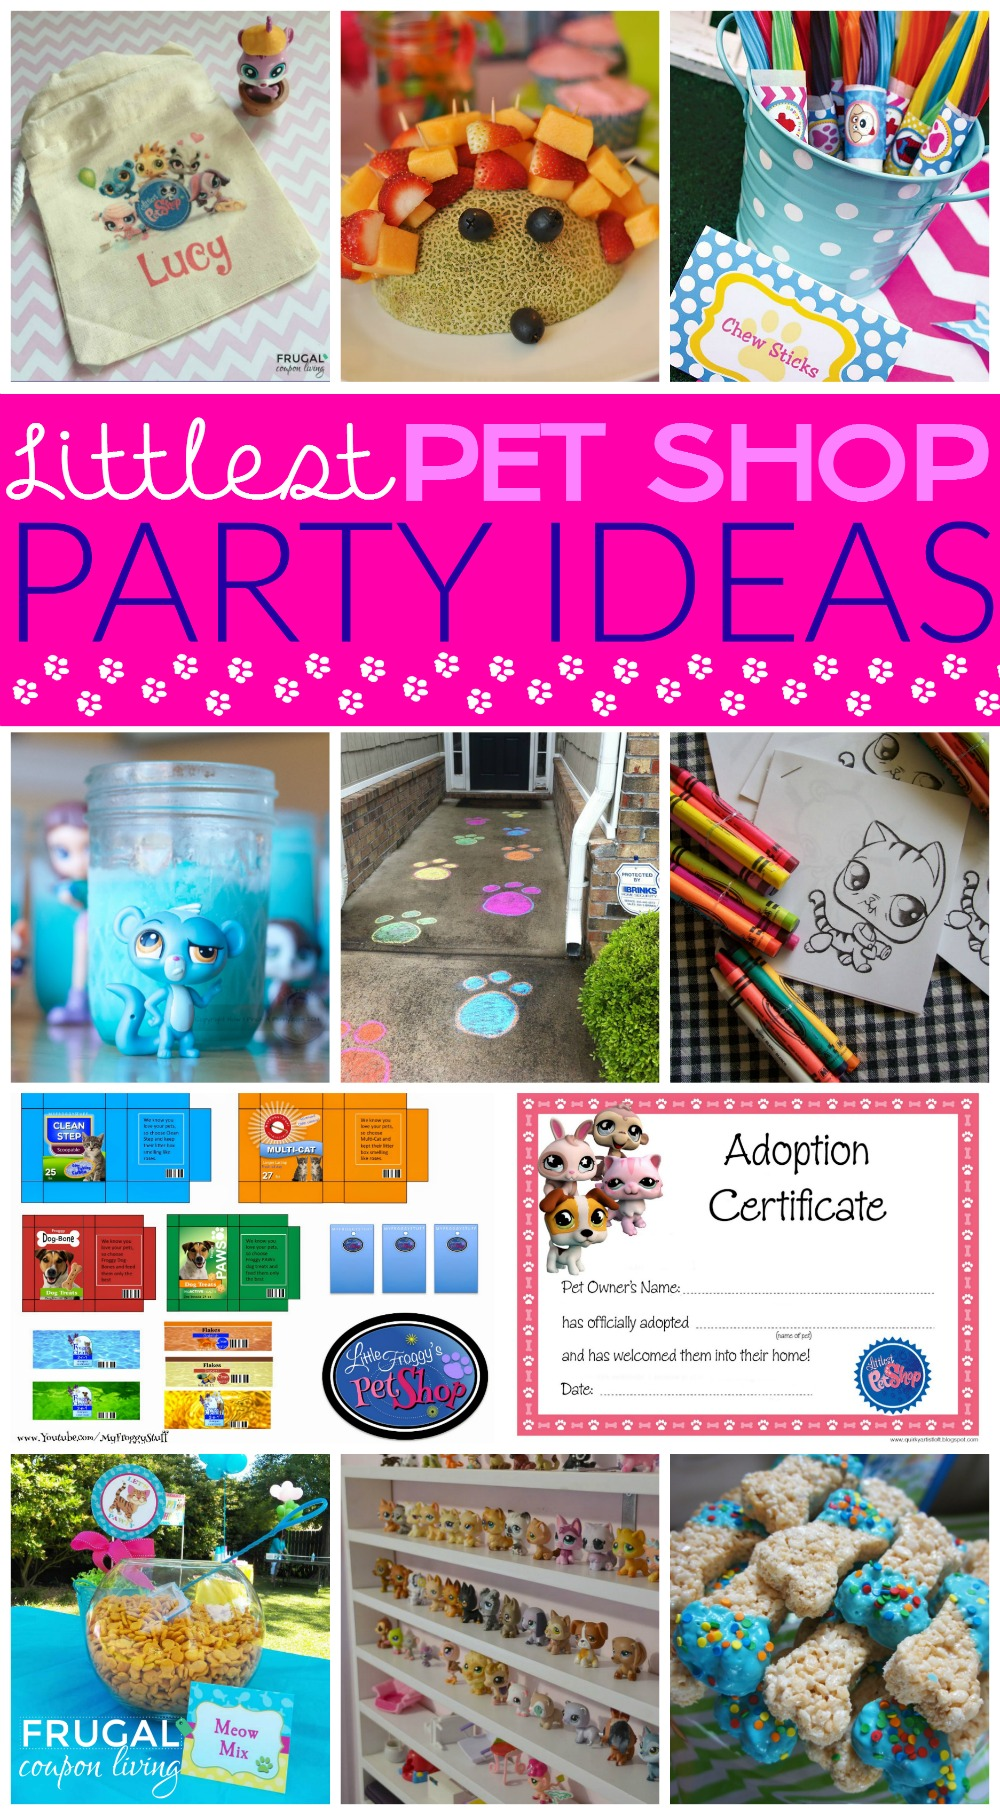 Littlest-Pet-Shop-Party-Ideas-frugal-coupon-living